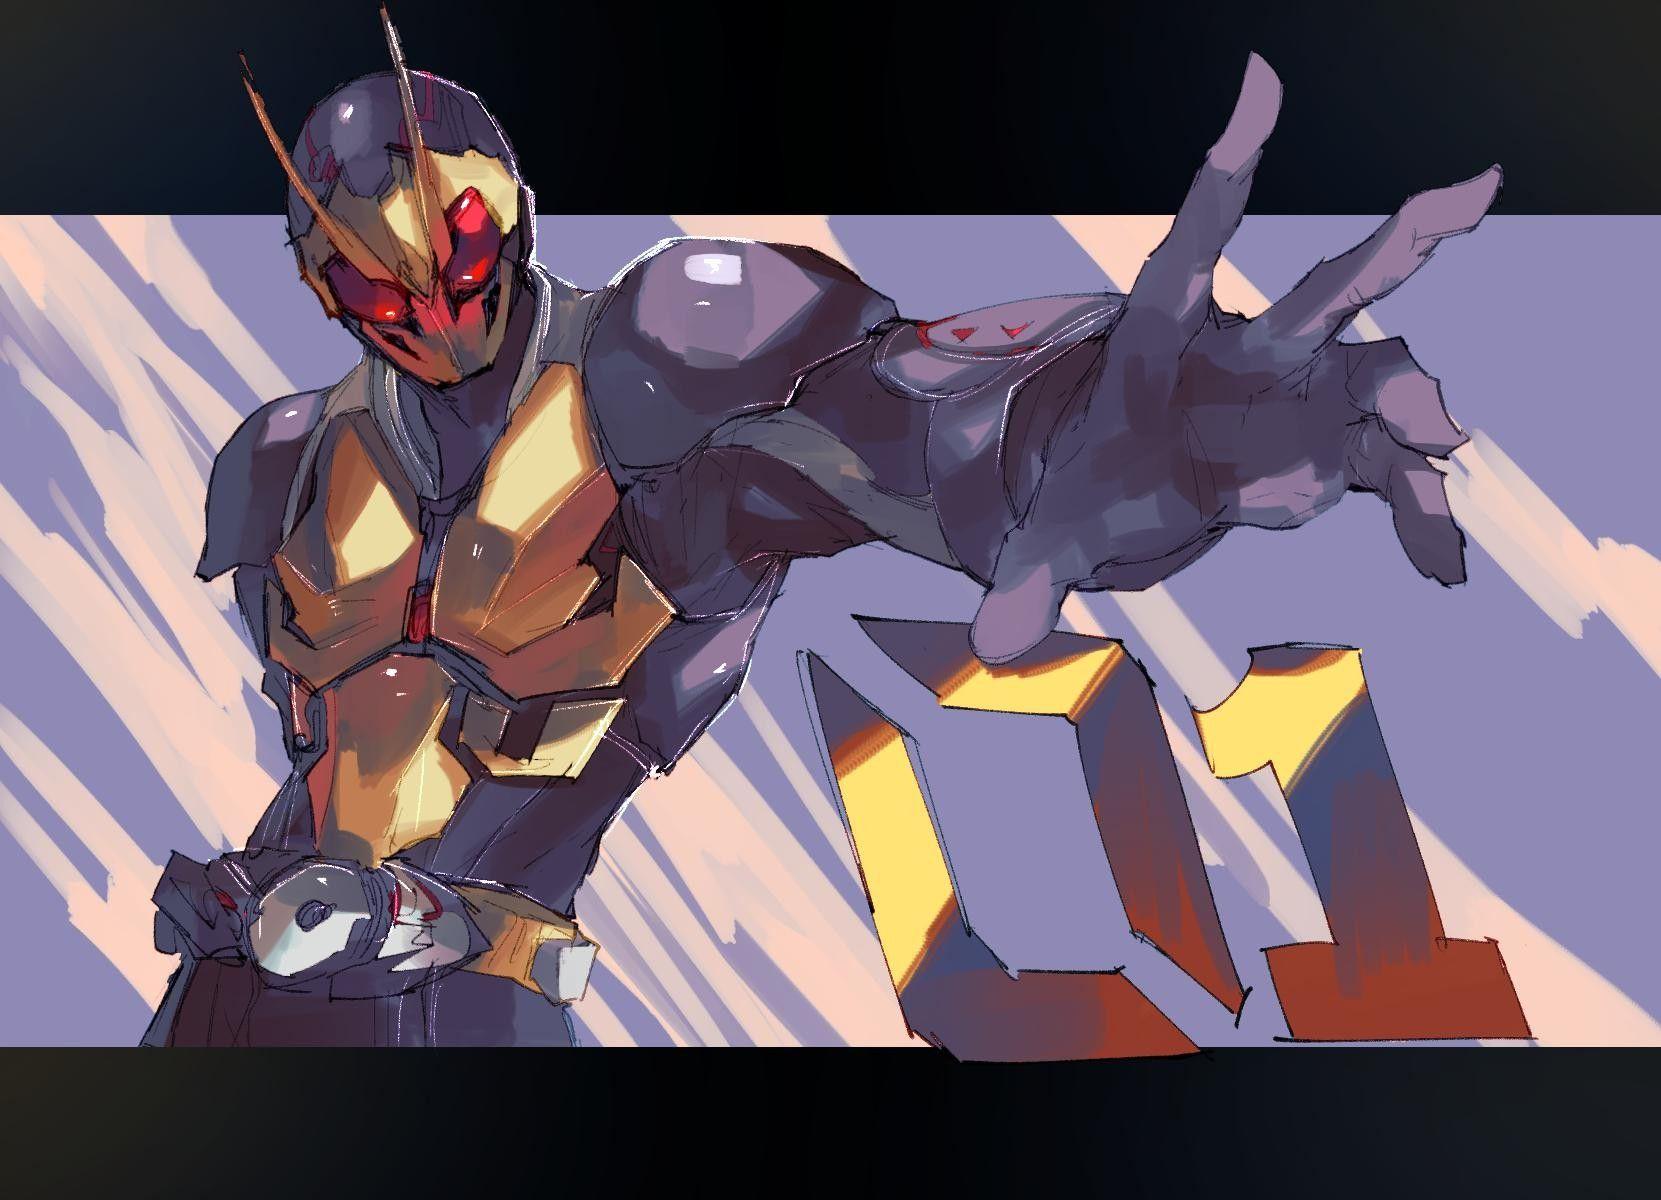 Pin By Codename Rf 517 On Kamen Rider Kamen Rider Wizard Kamen Rider Rider